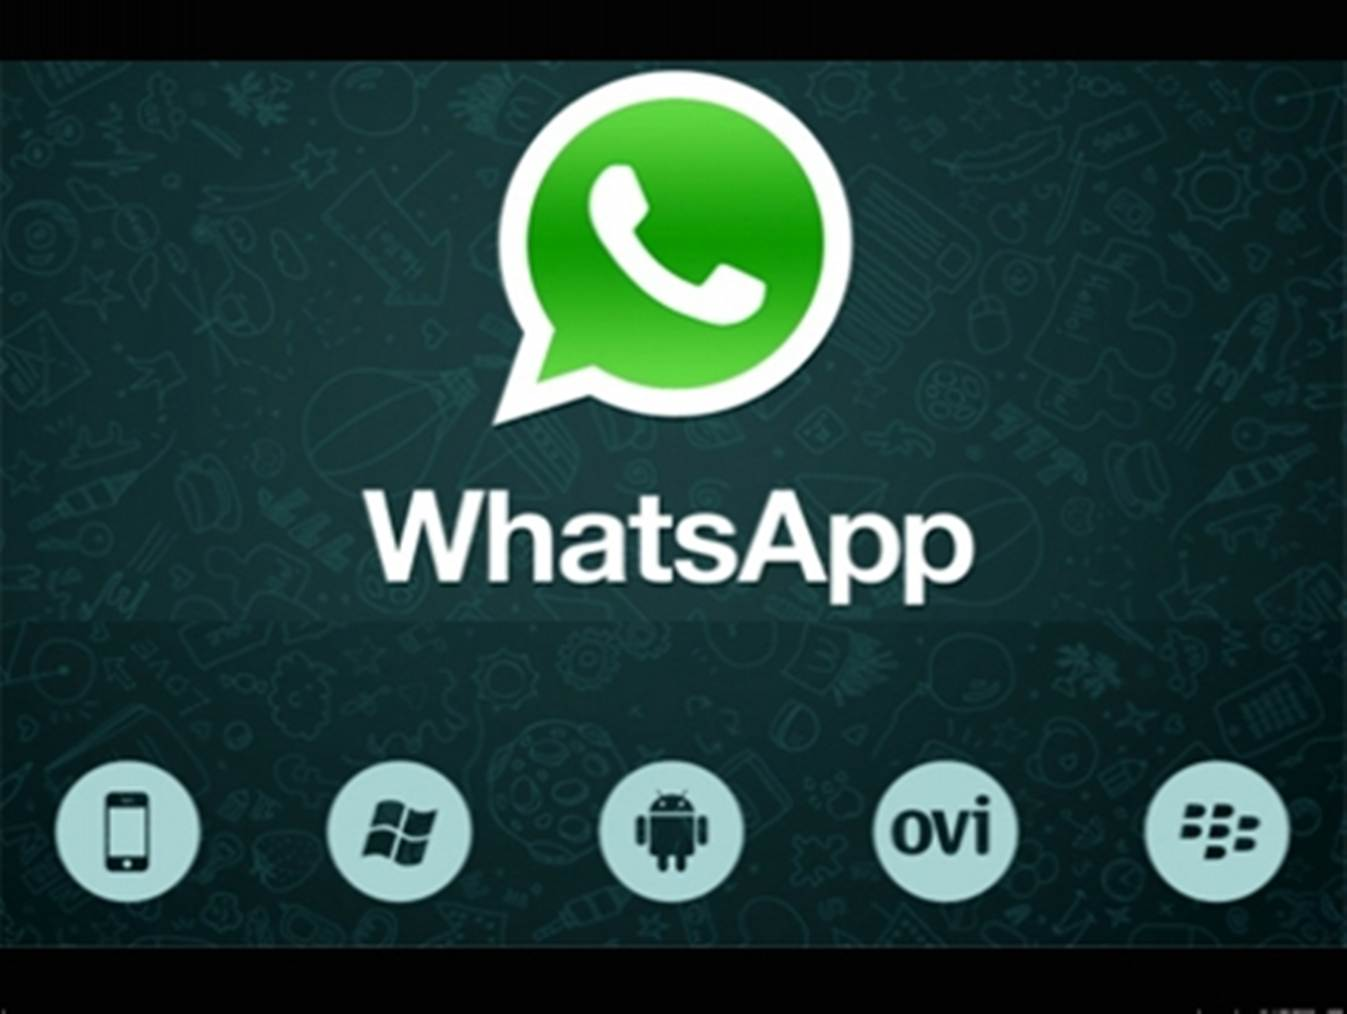 تحميل تطبيق واتس اصدار 2014/2015